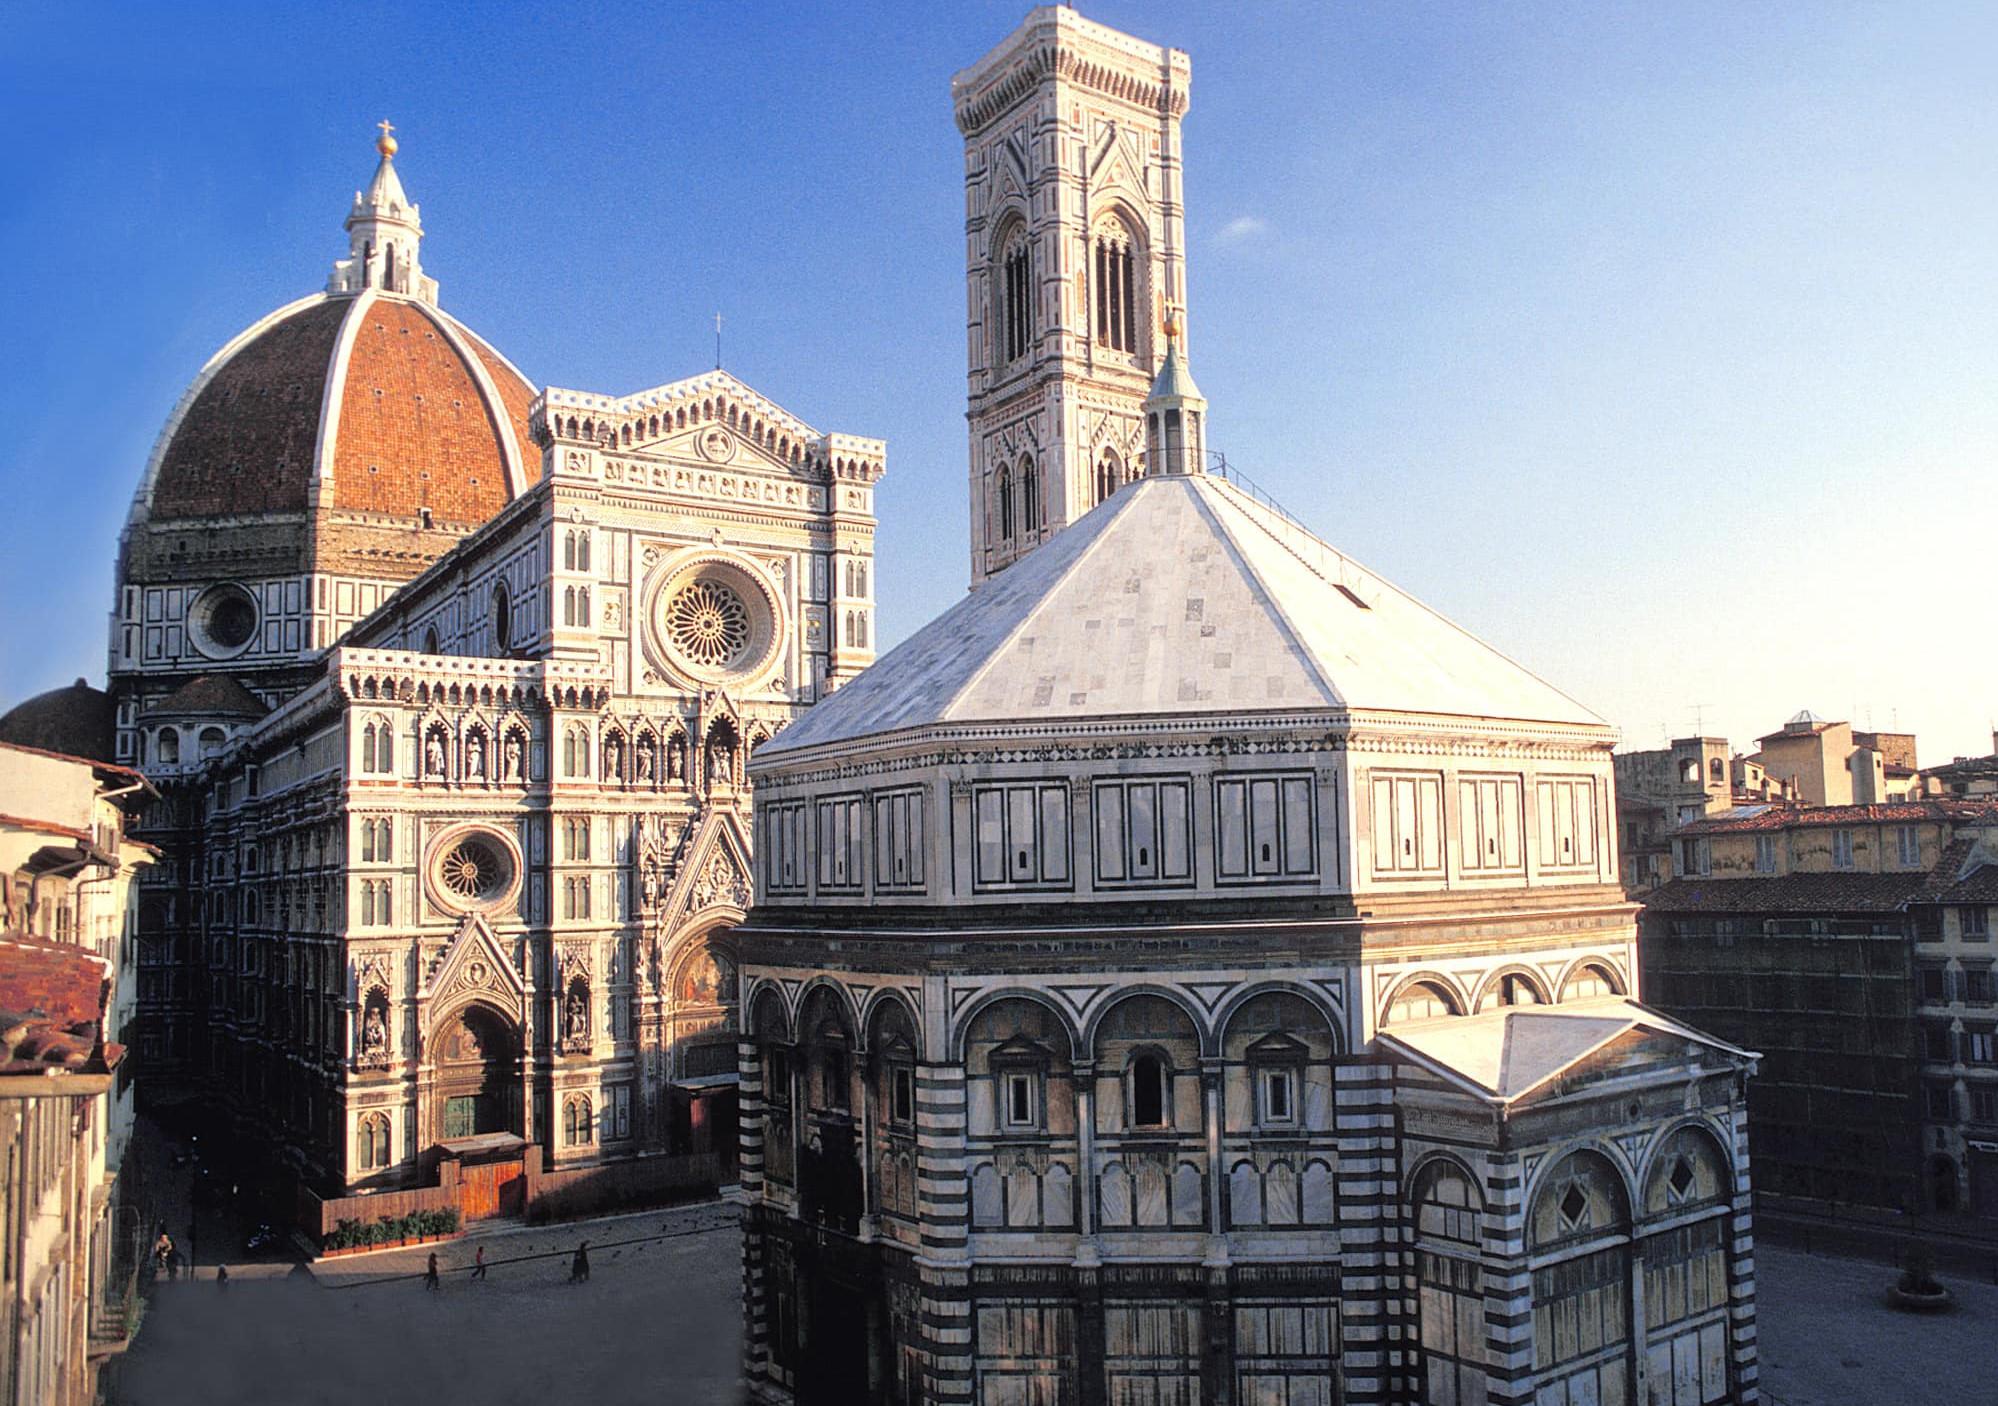 Wandeltocht Florence + Accademia, Uffizi sla de rij over